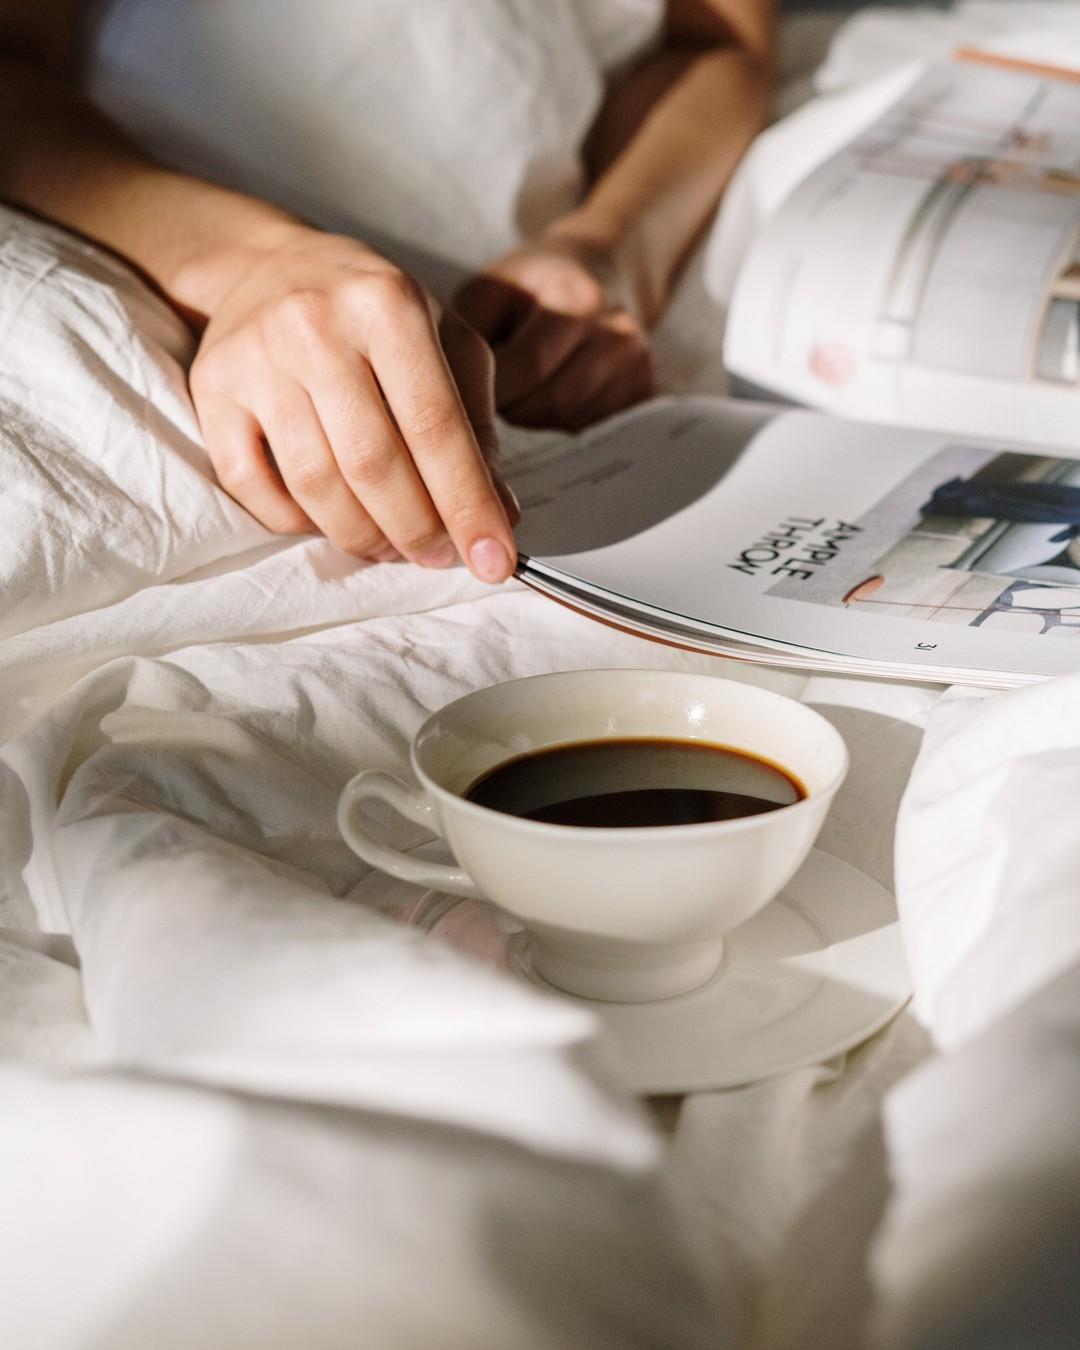 Me time. #coffee #coffeetime #coffeelover #coffeeaddict #coffeeshop #coffeebreak #coffeegram #coffeelovers #coffeelove #coffeeholic #coffeelife #coffeeoftheday #coffeeart #coffeecup #coffeetable #coffeeporn #coffeehouse #coffeebean #coffeesesh #coffeeshot #coffeeholic #coffeeoftheday #coffeelife #cupsinframe #butfirstcoffee #coffeemovement #teabreak #teaonly #teacuplove #teaandseasons